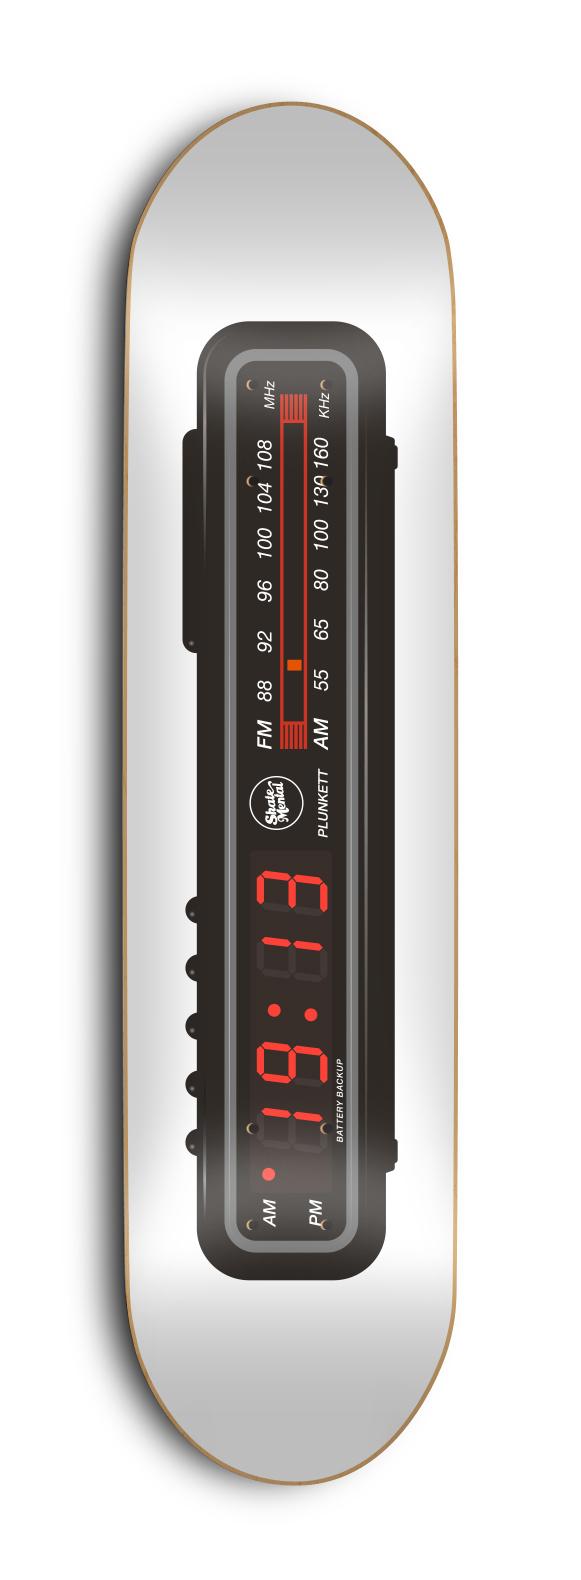 Deck_Mock_Plunkett_Alarm-Clock.jpg